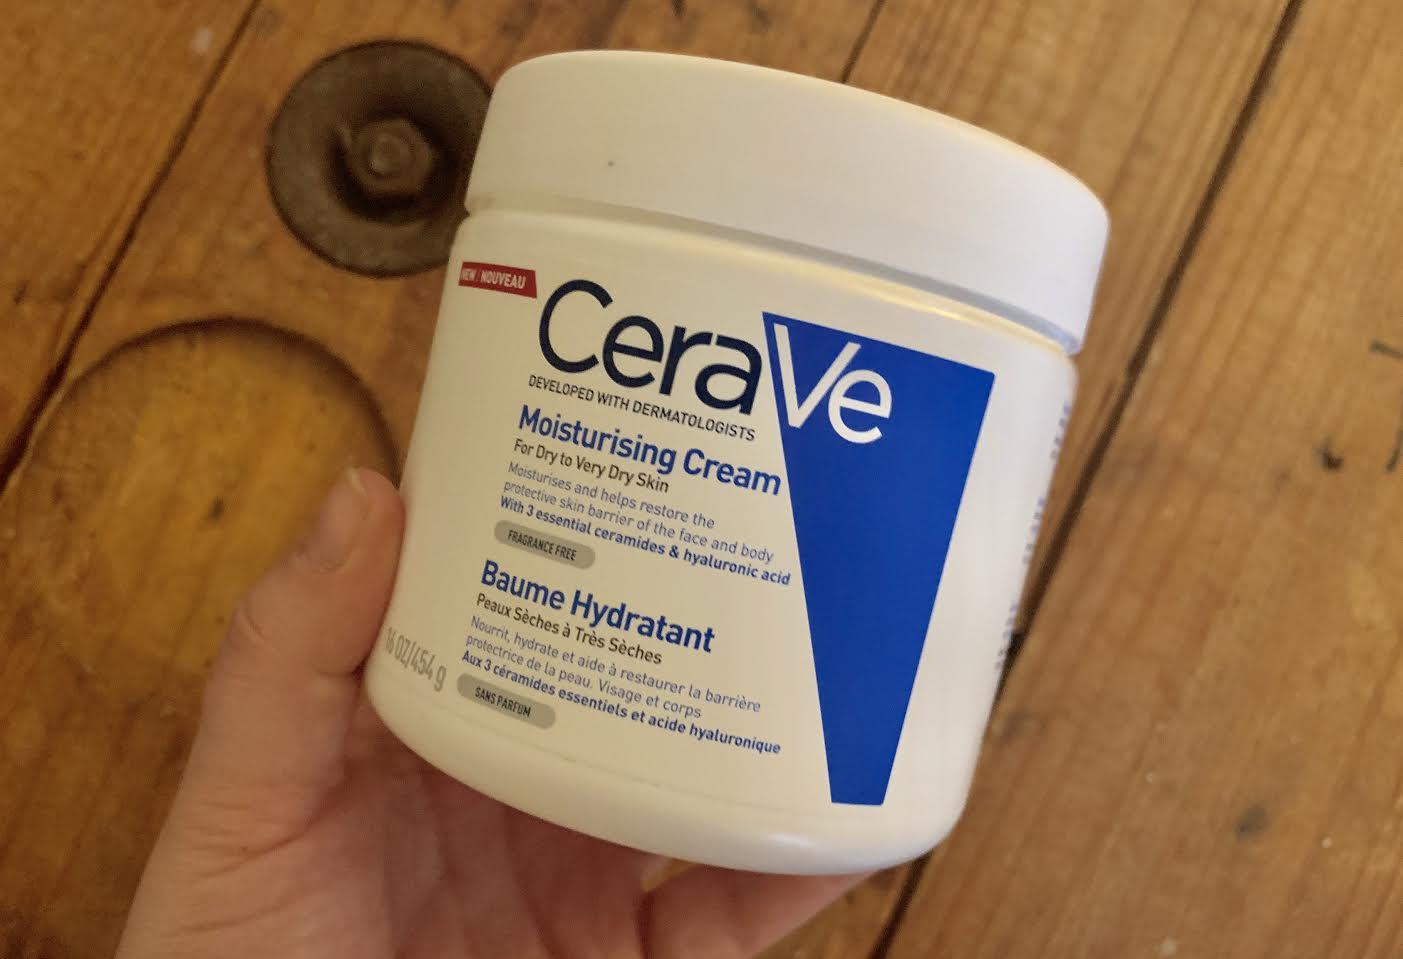 Baume hydratant CeraVe